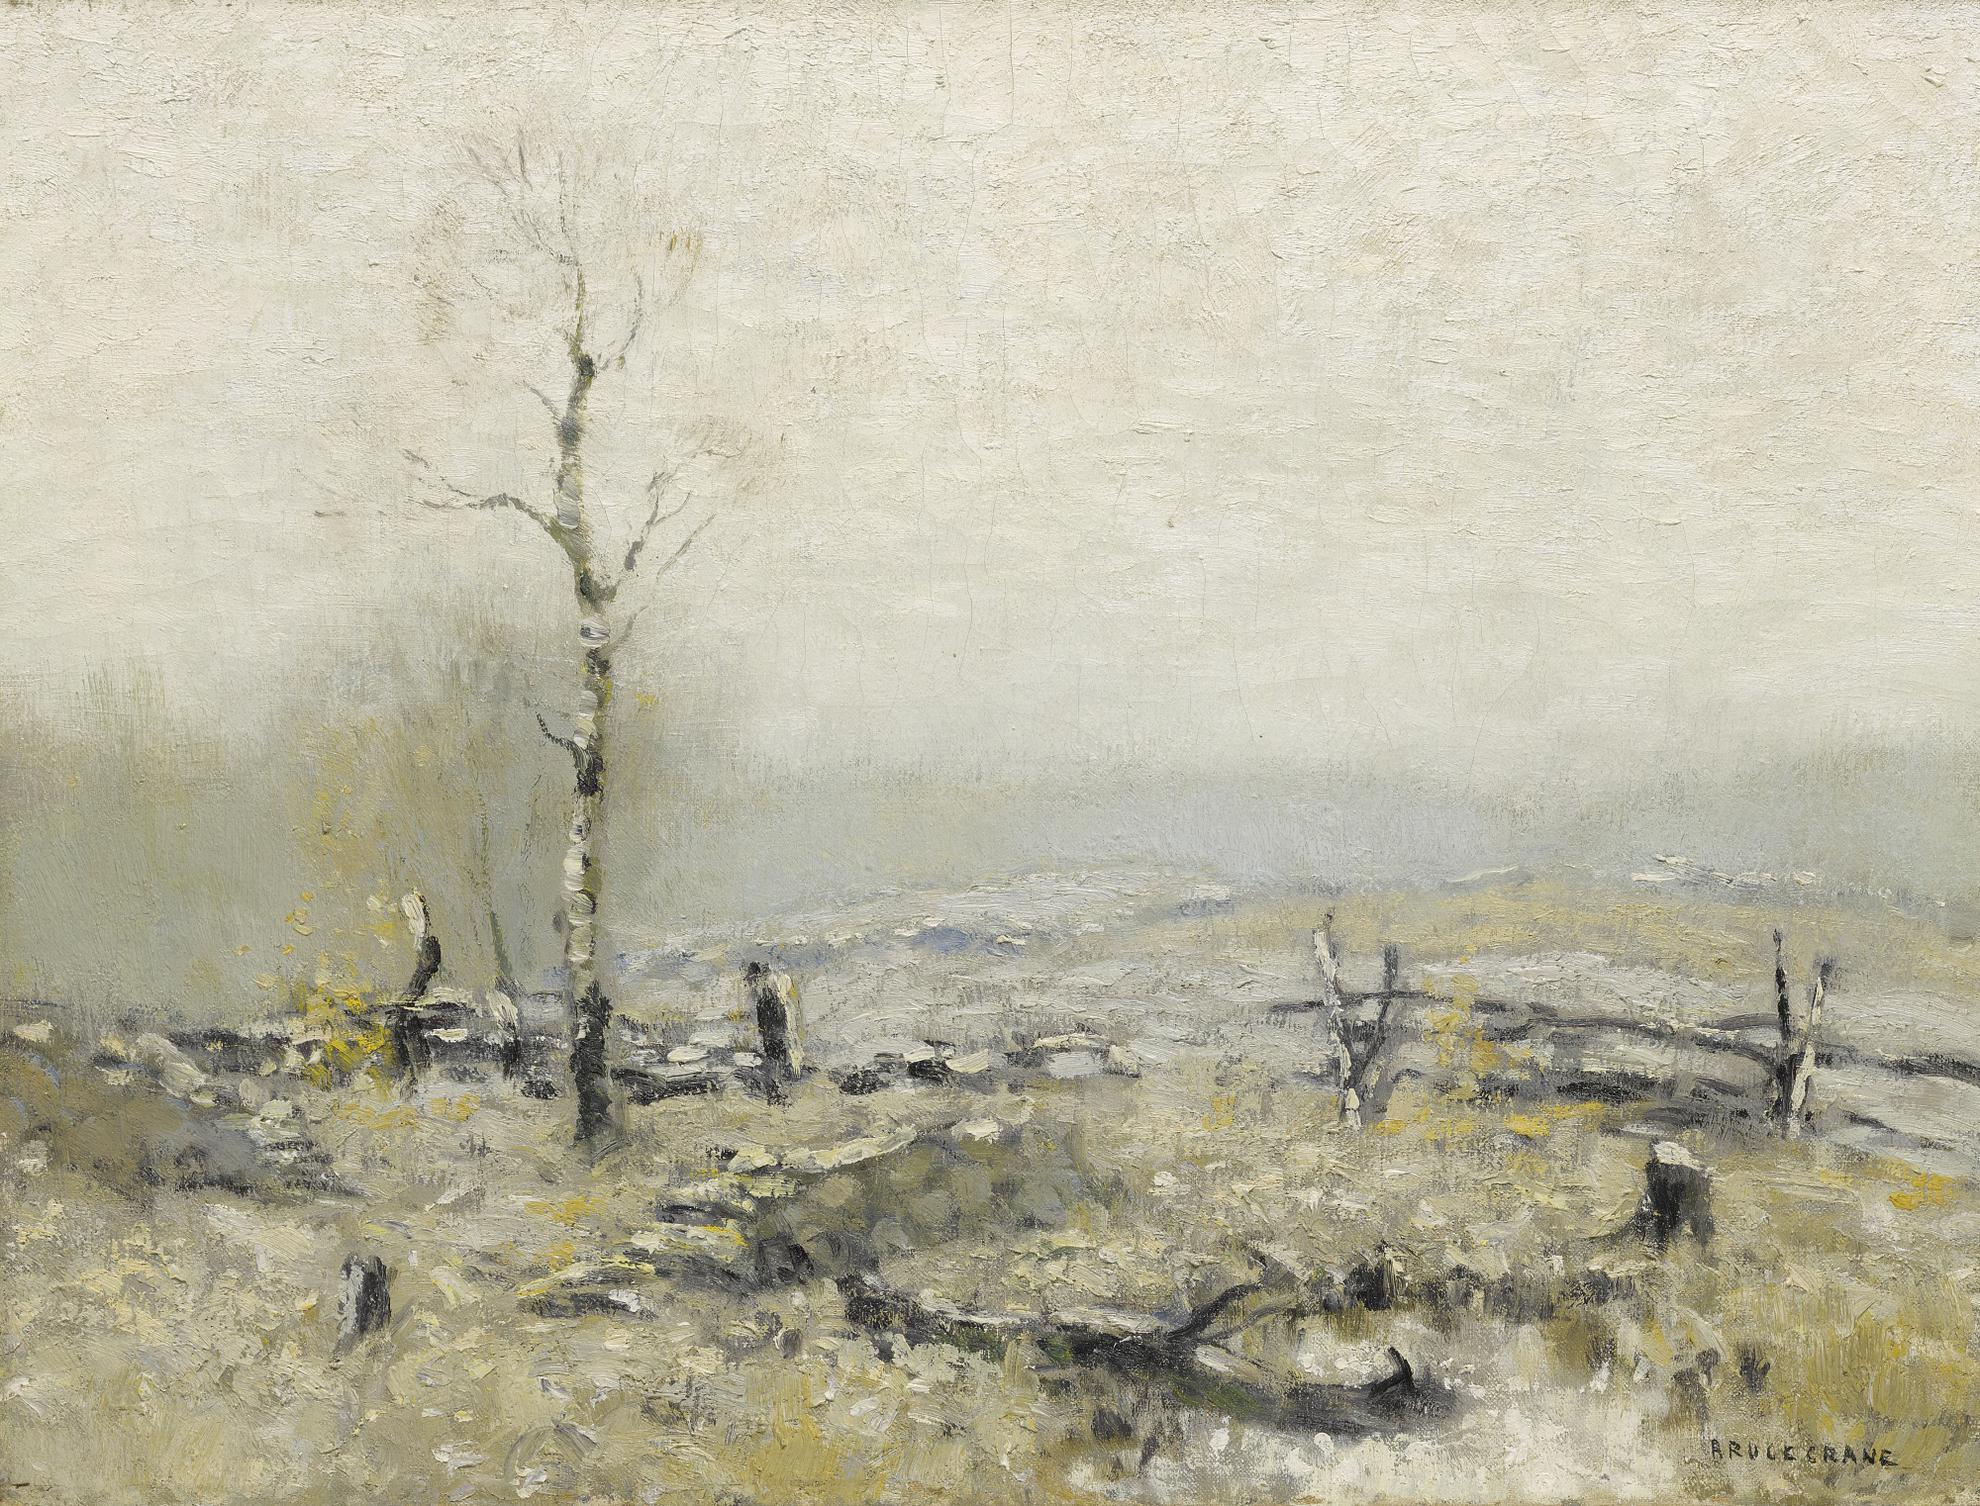 Bruce Crane - Wintry Landscape-